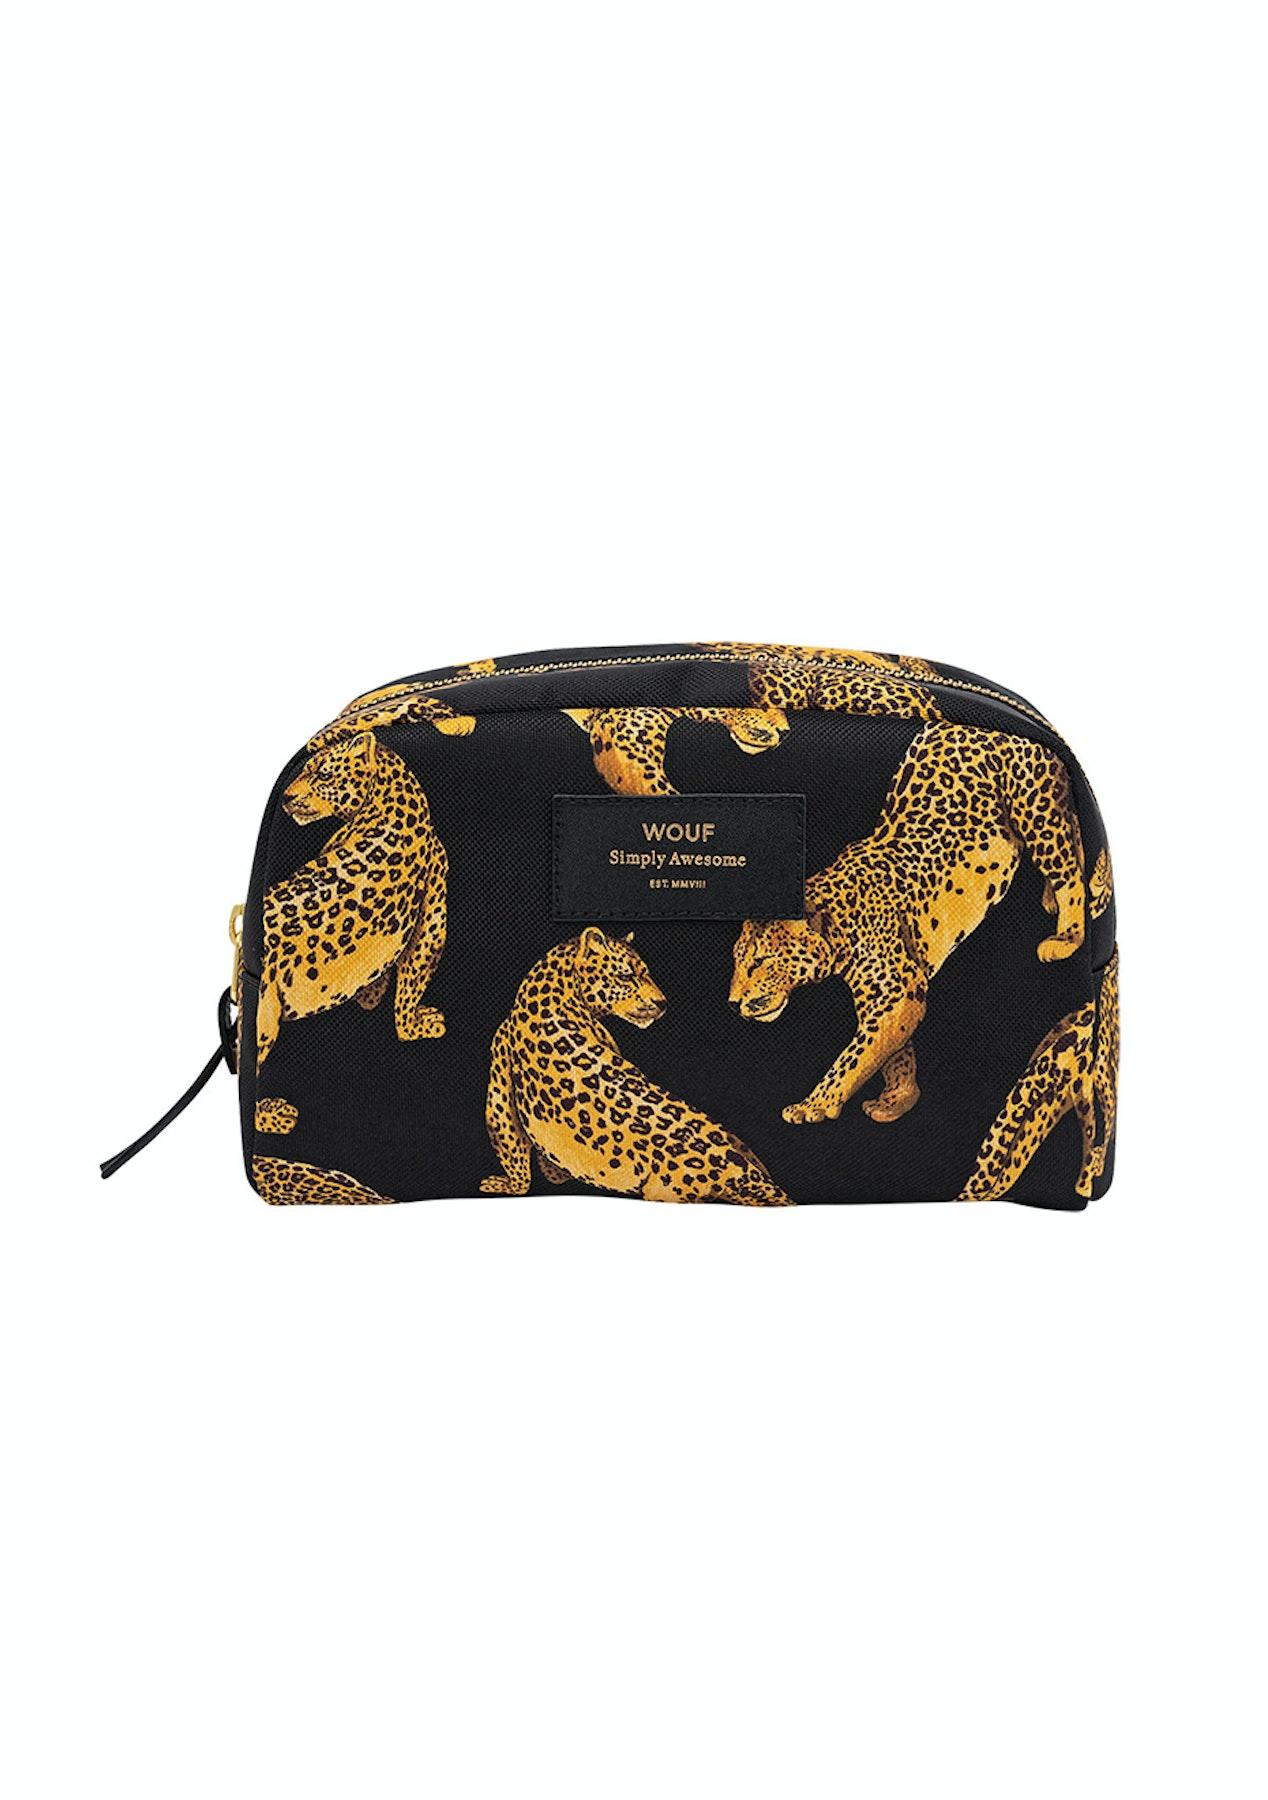 Wouf: Big Beauty Black Leopard